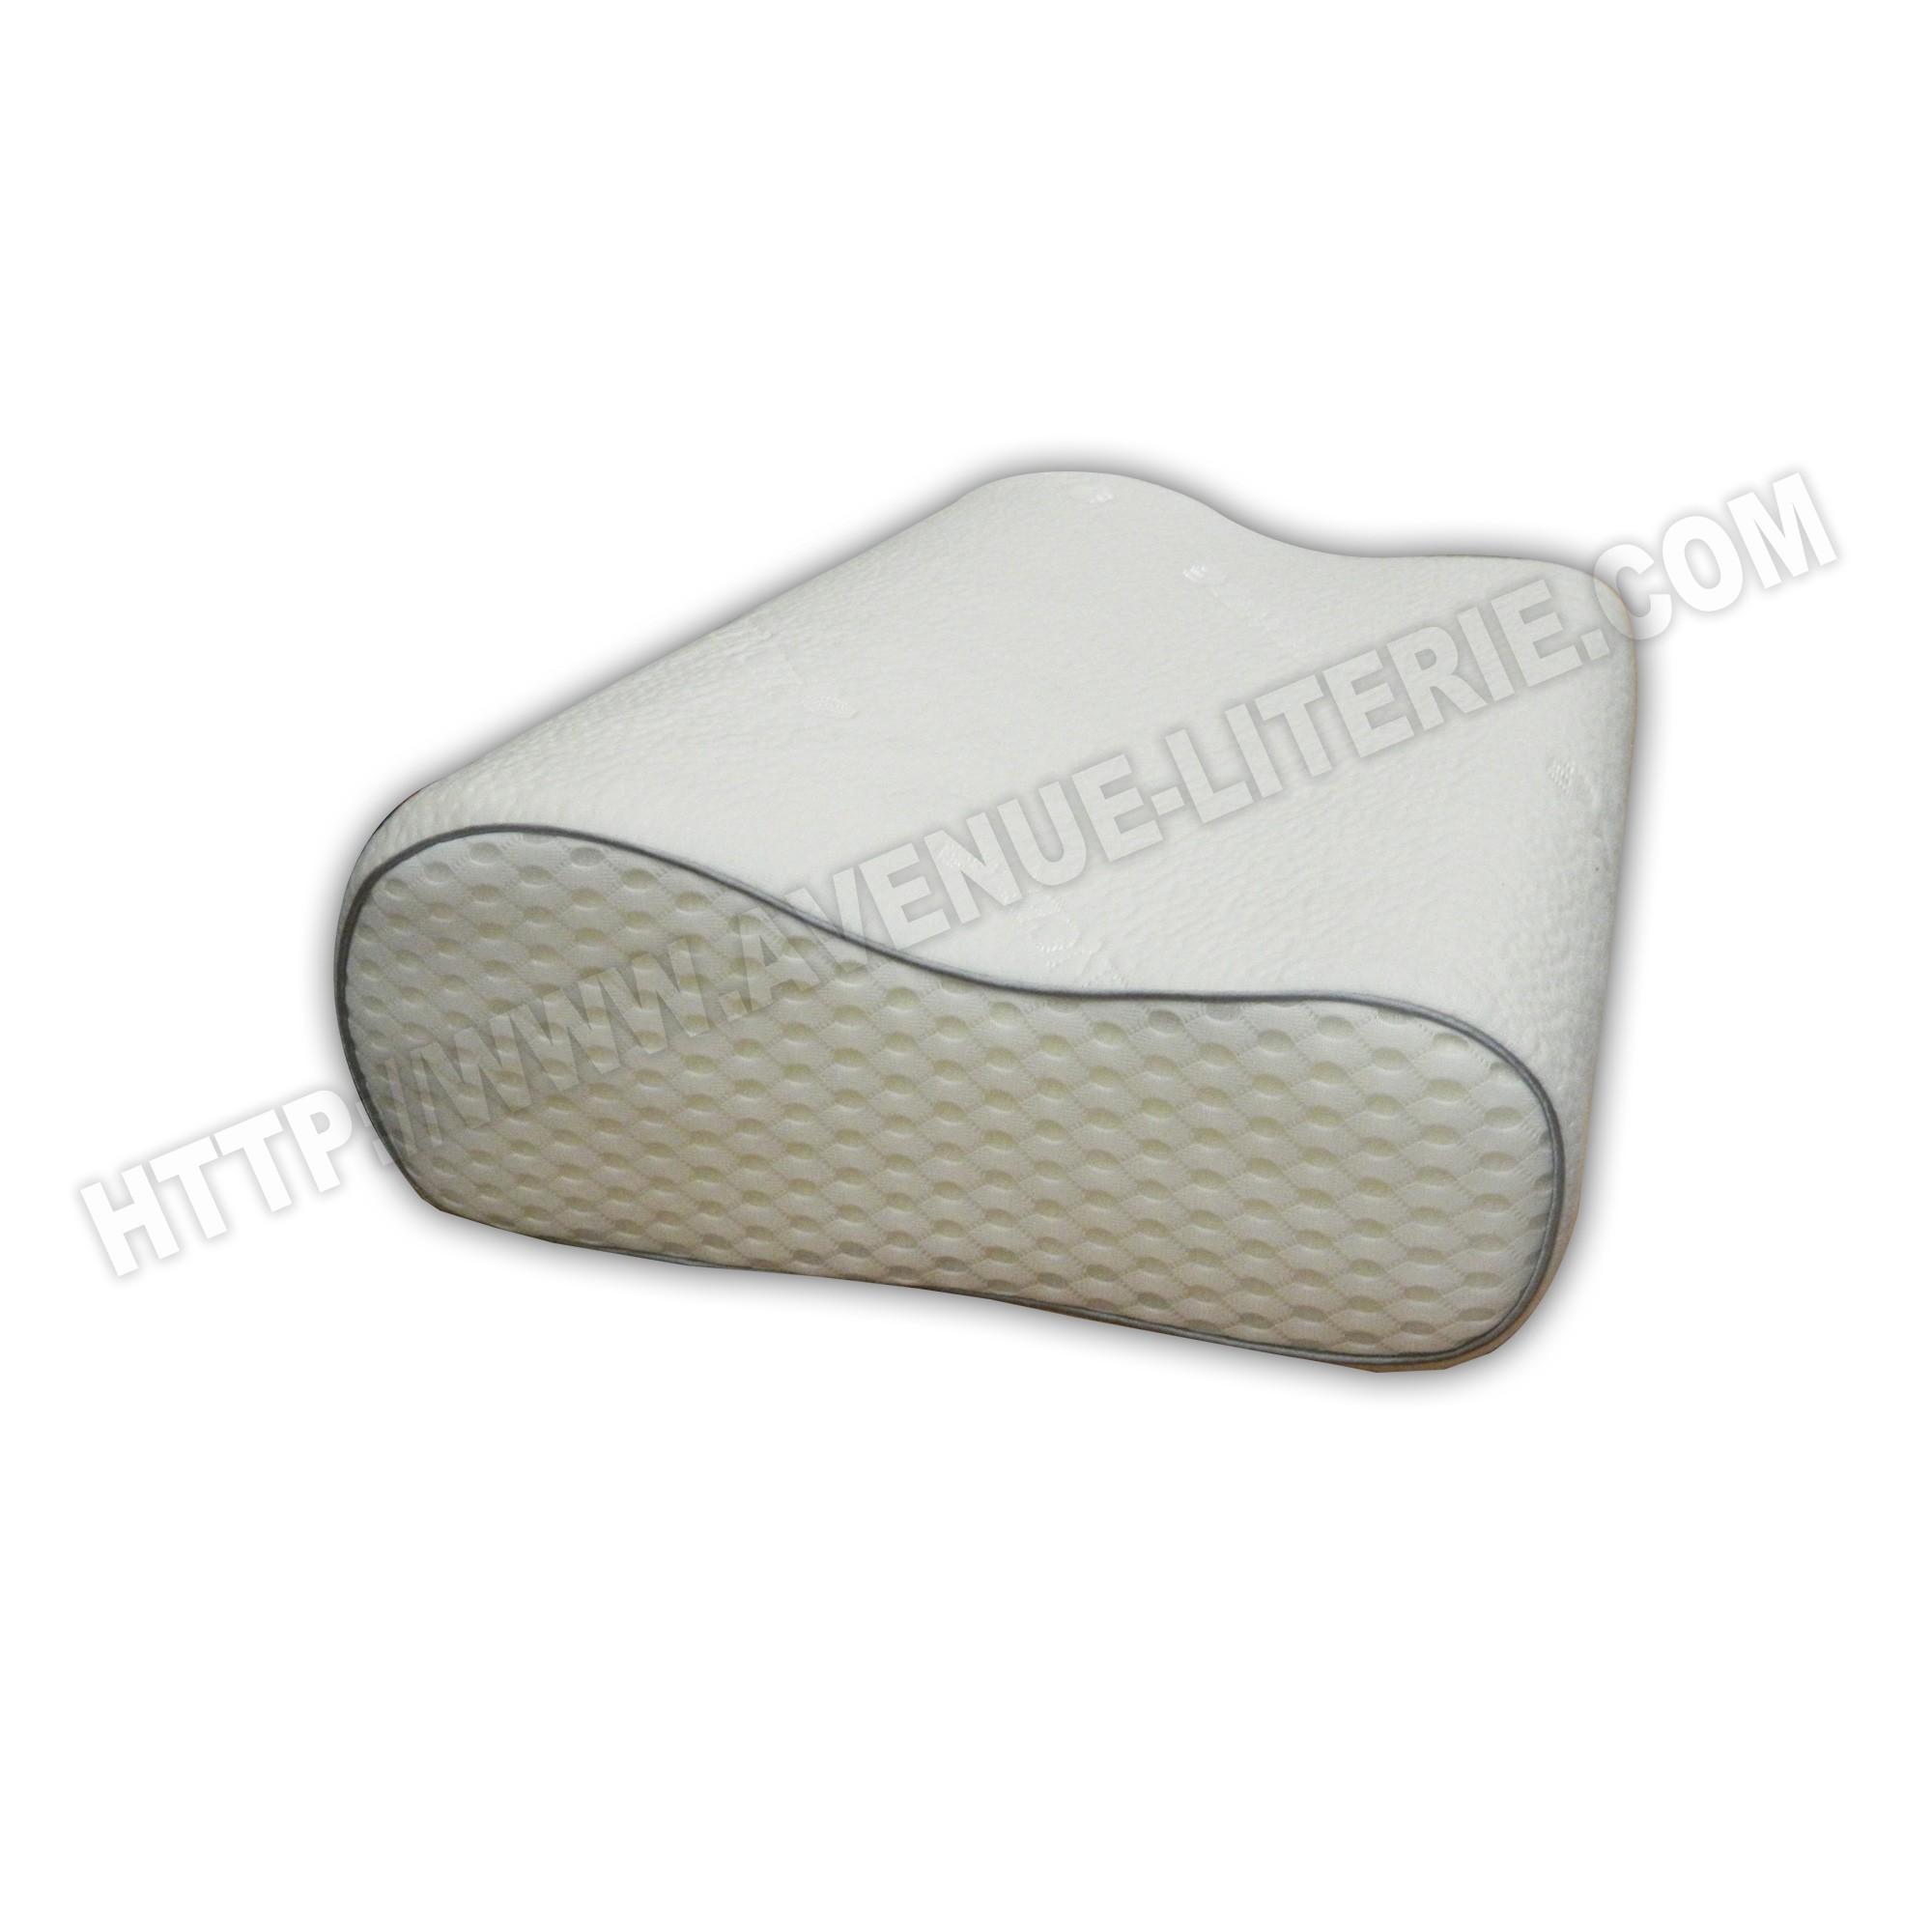 oreiller anatomique bultex 32x52. Black Bedroom Furniture Sets. Home Design Ideas